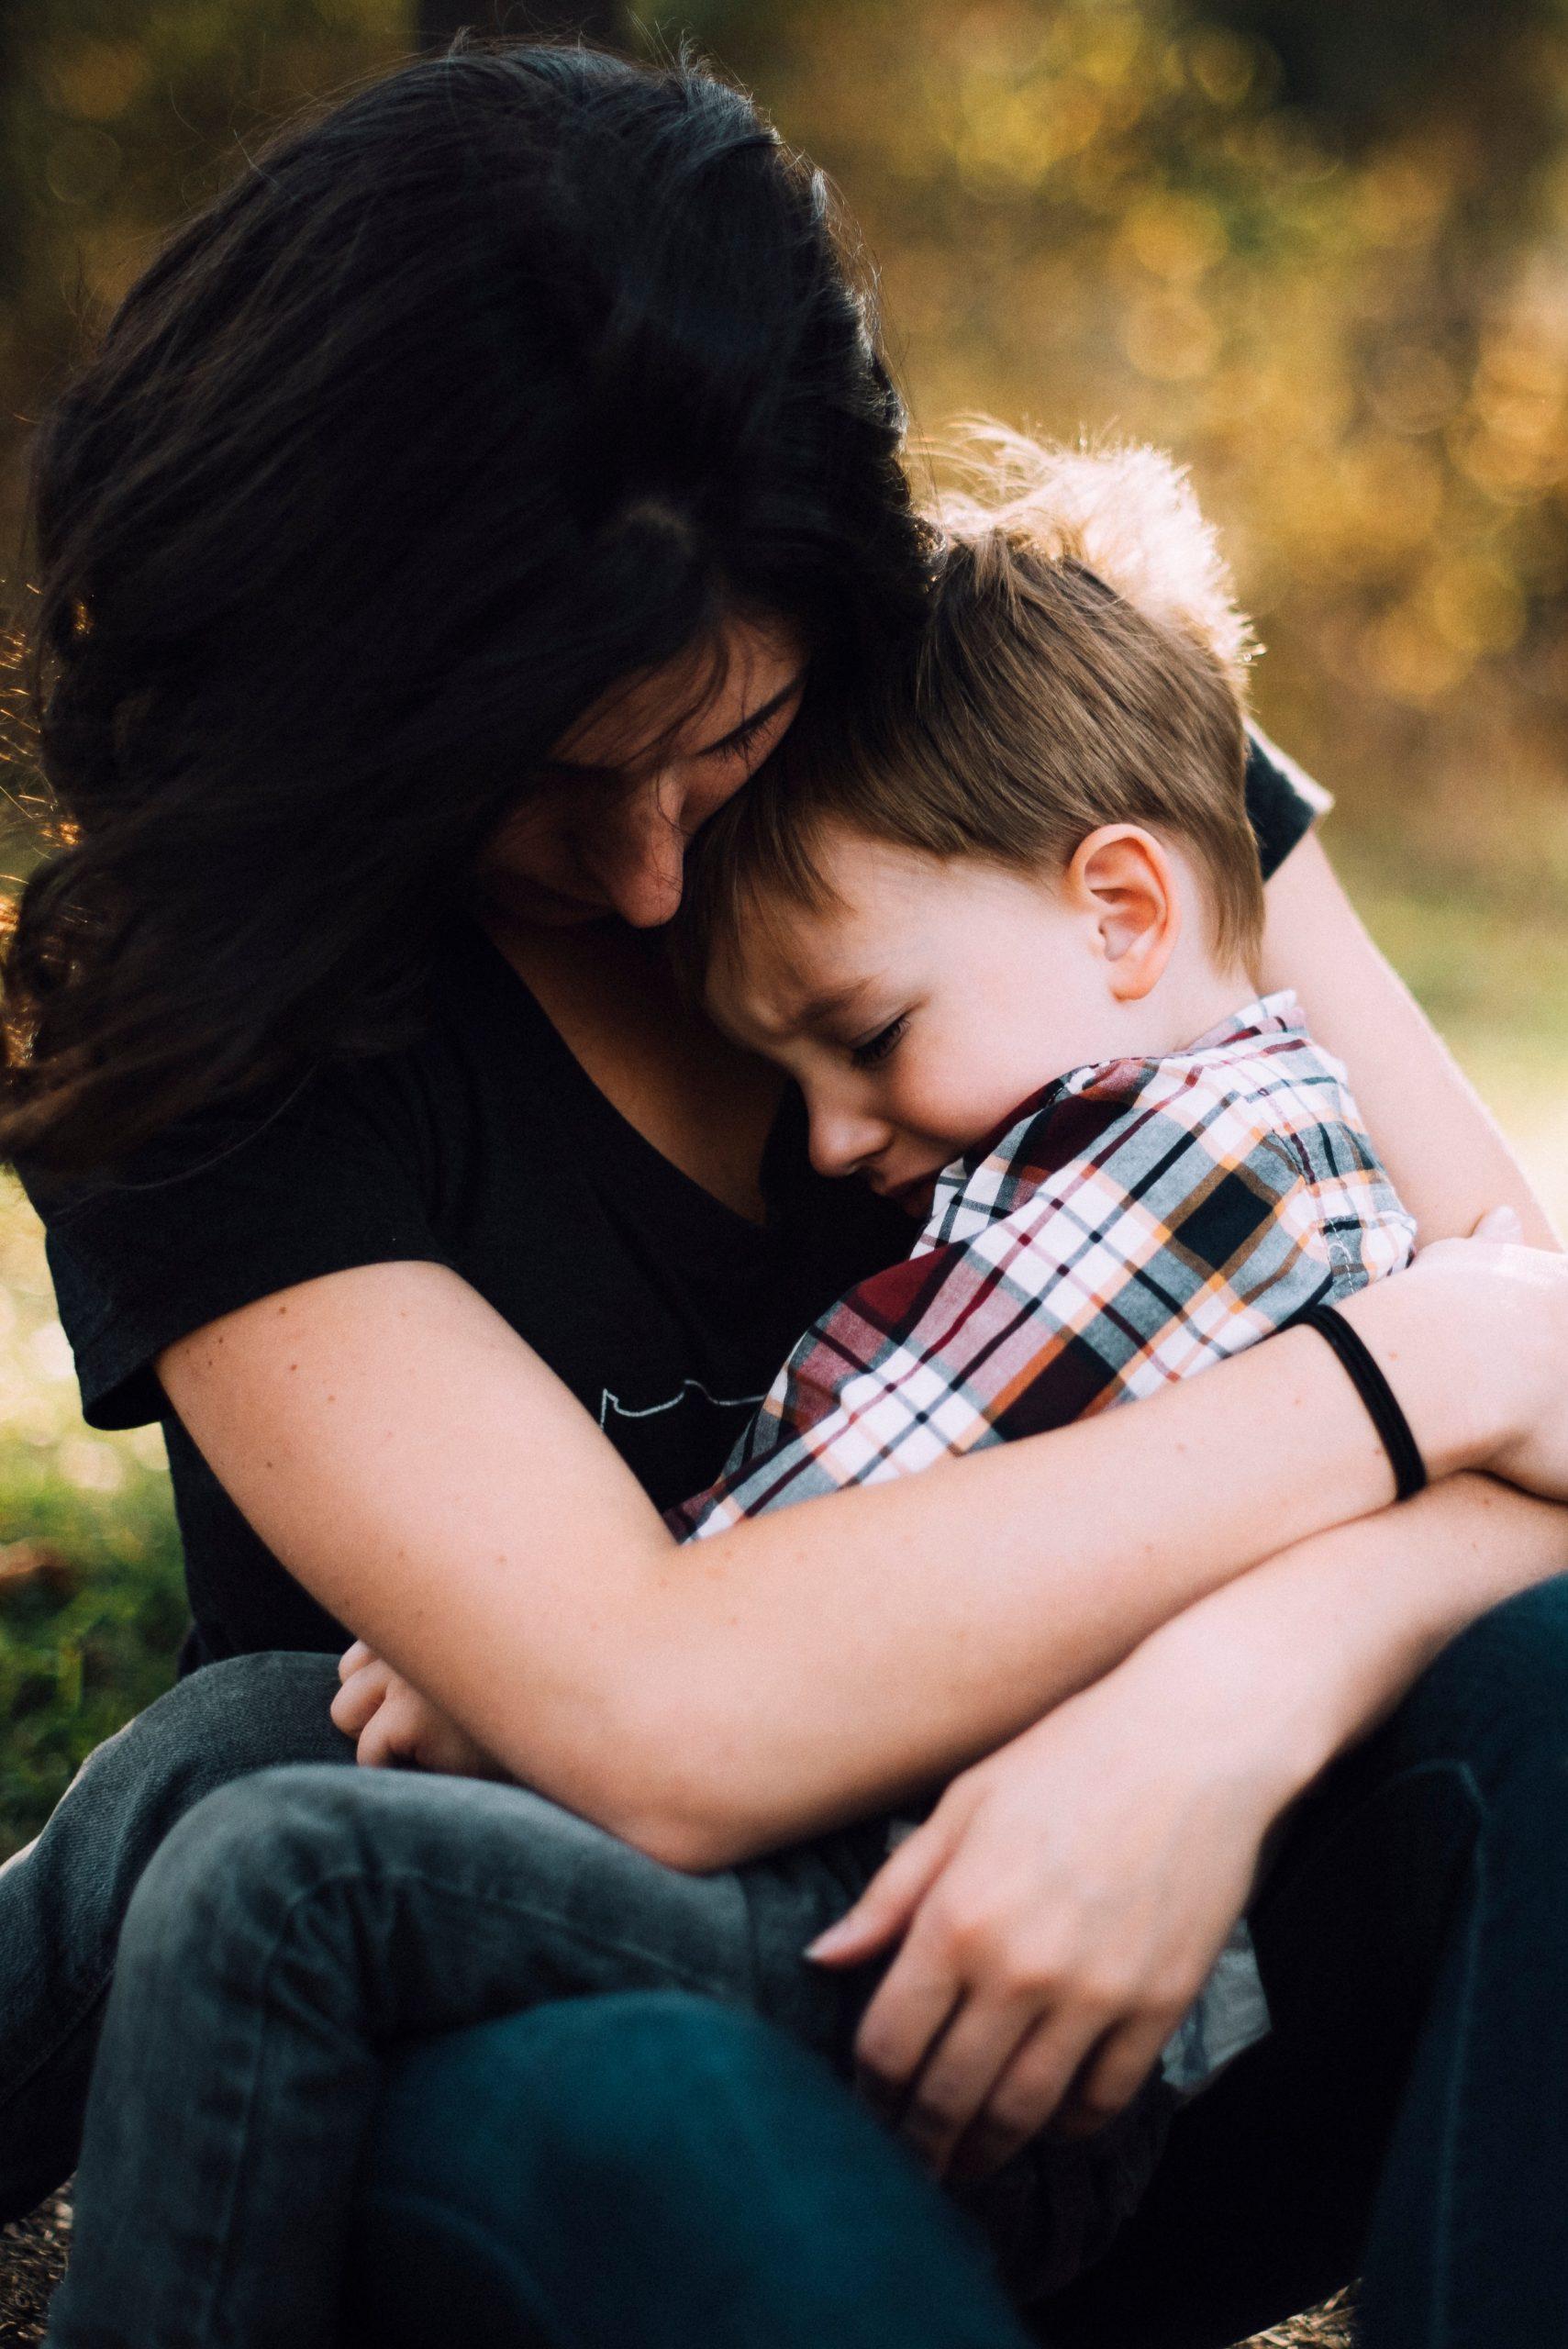 mama przytula dziecko